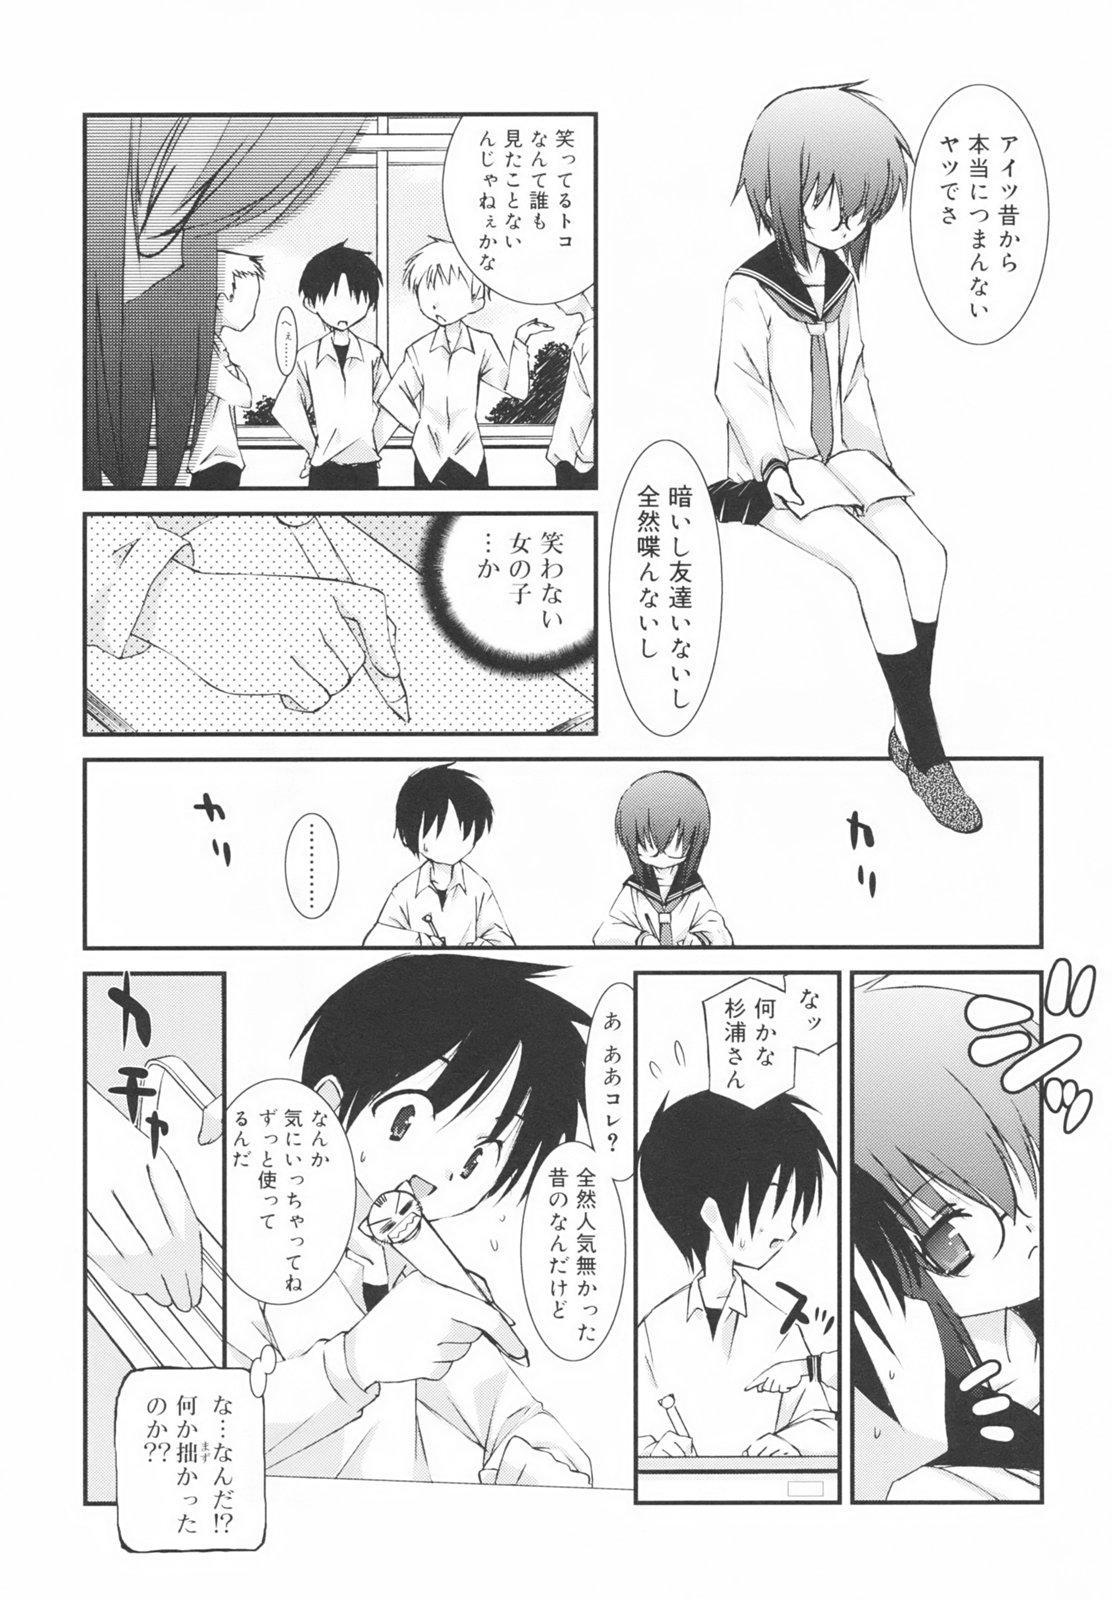 Gakkou No Nai Hi - A Day without School 16